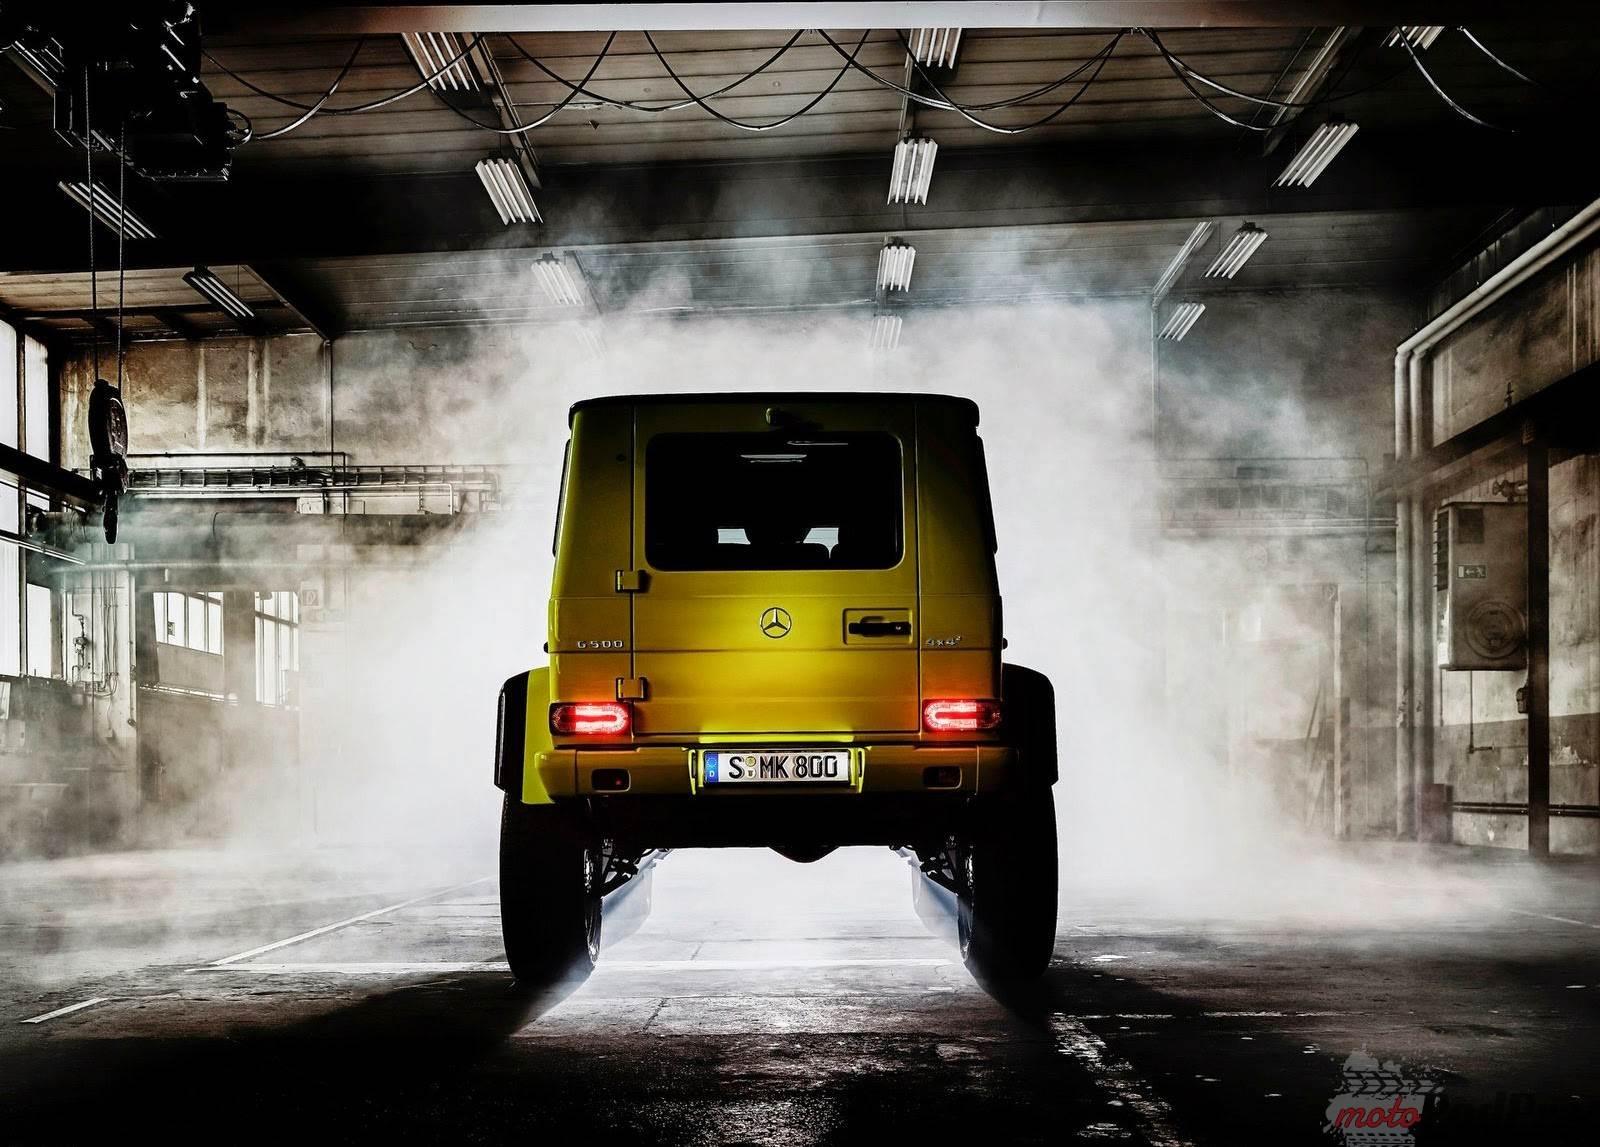 2015 Mercedes Benz G500 4x4 2 Concept 2 Mercedes Benz G5004x4 2 Concept ulepszoną Gelendą?